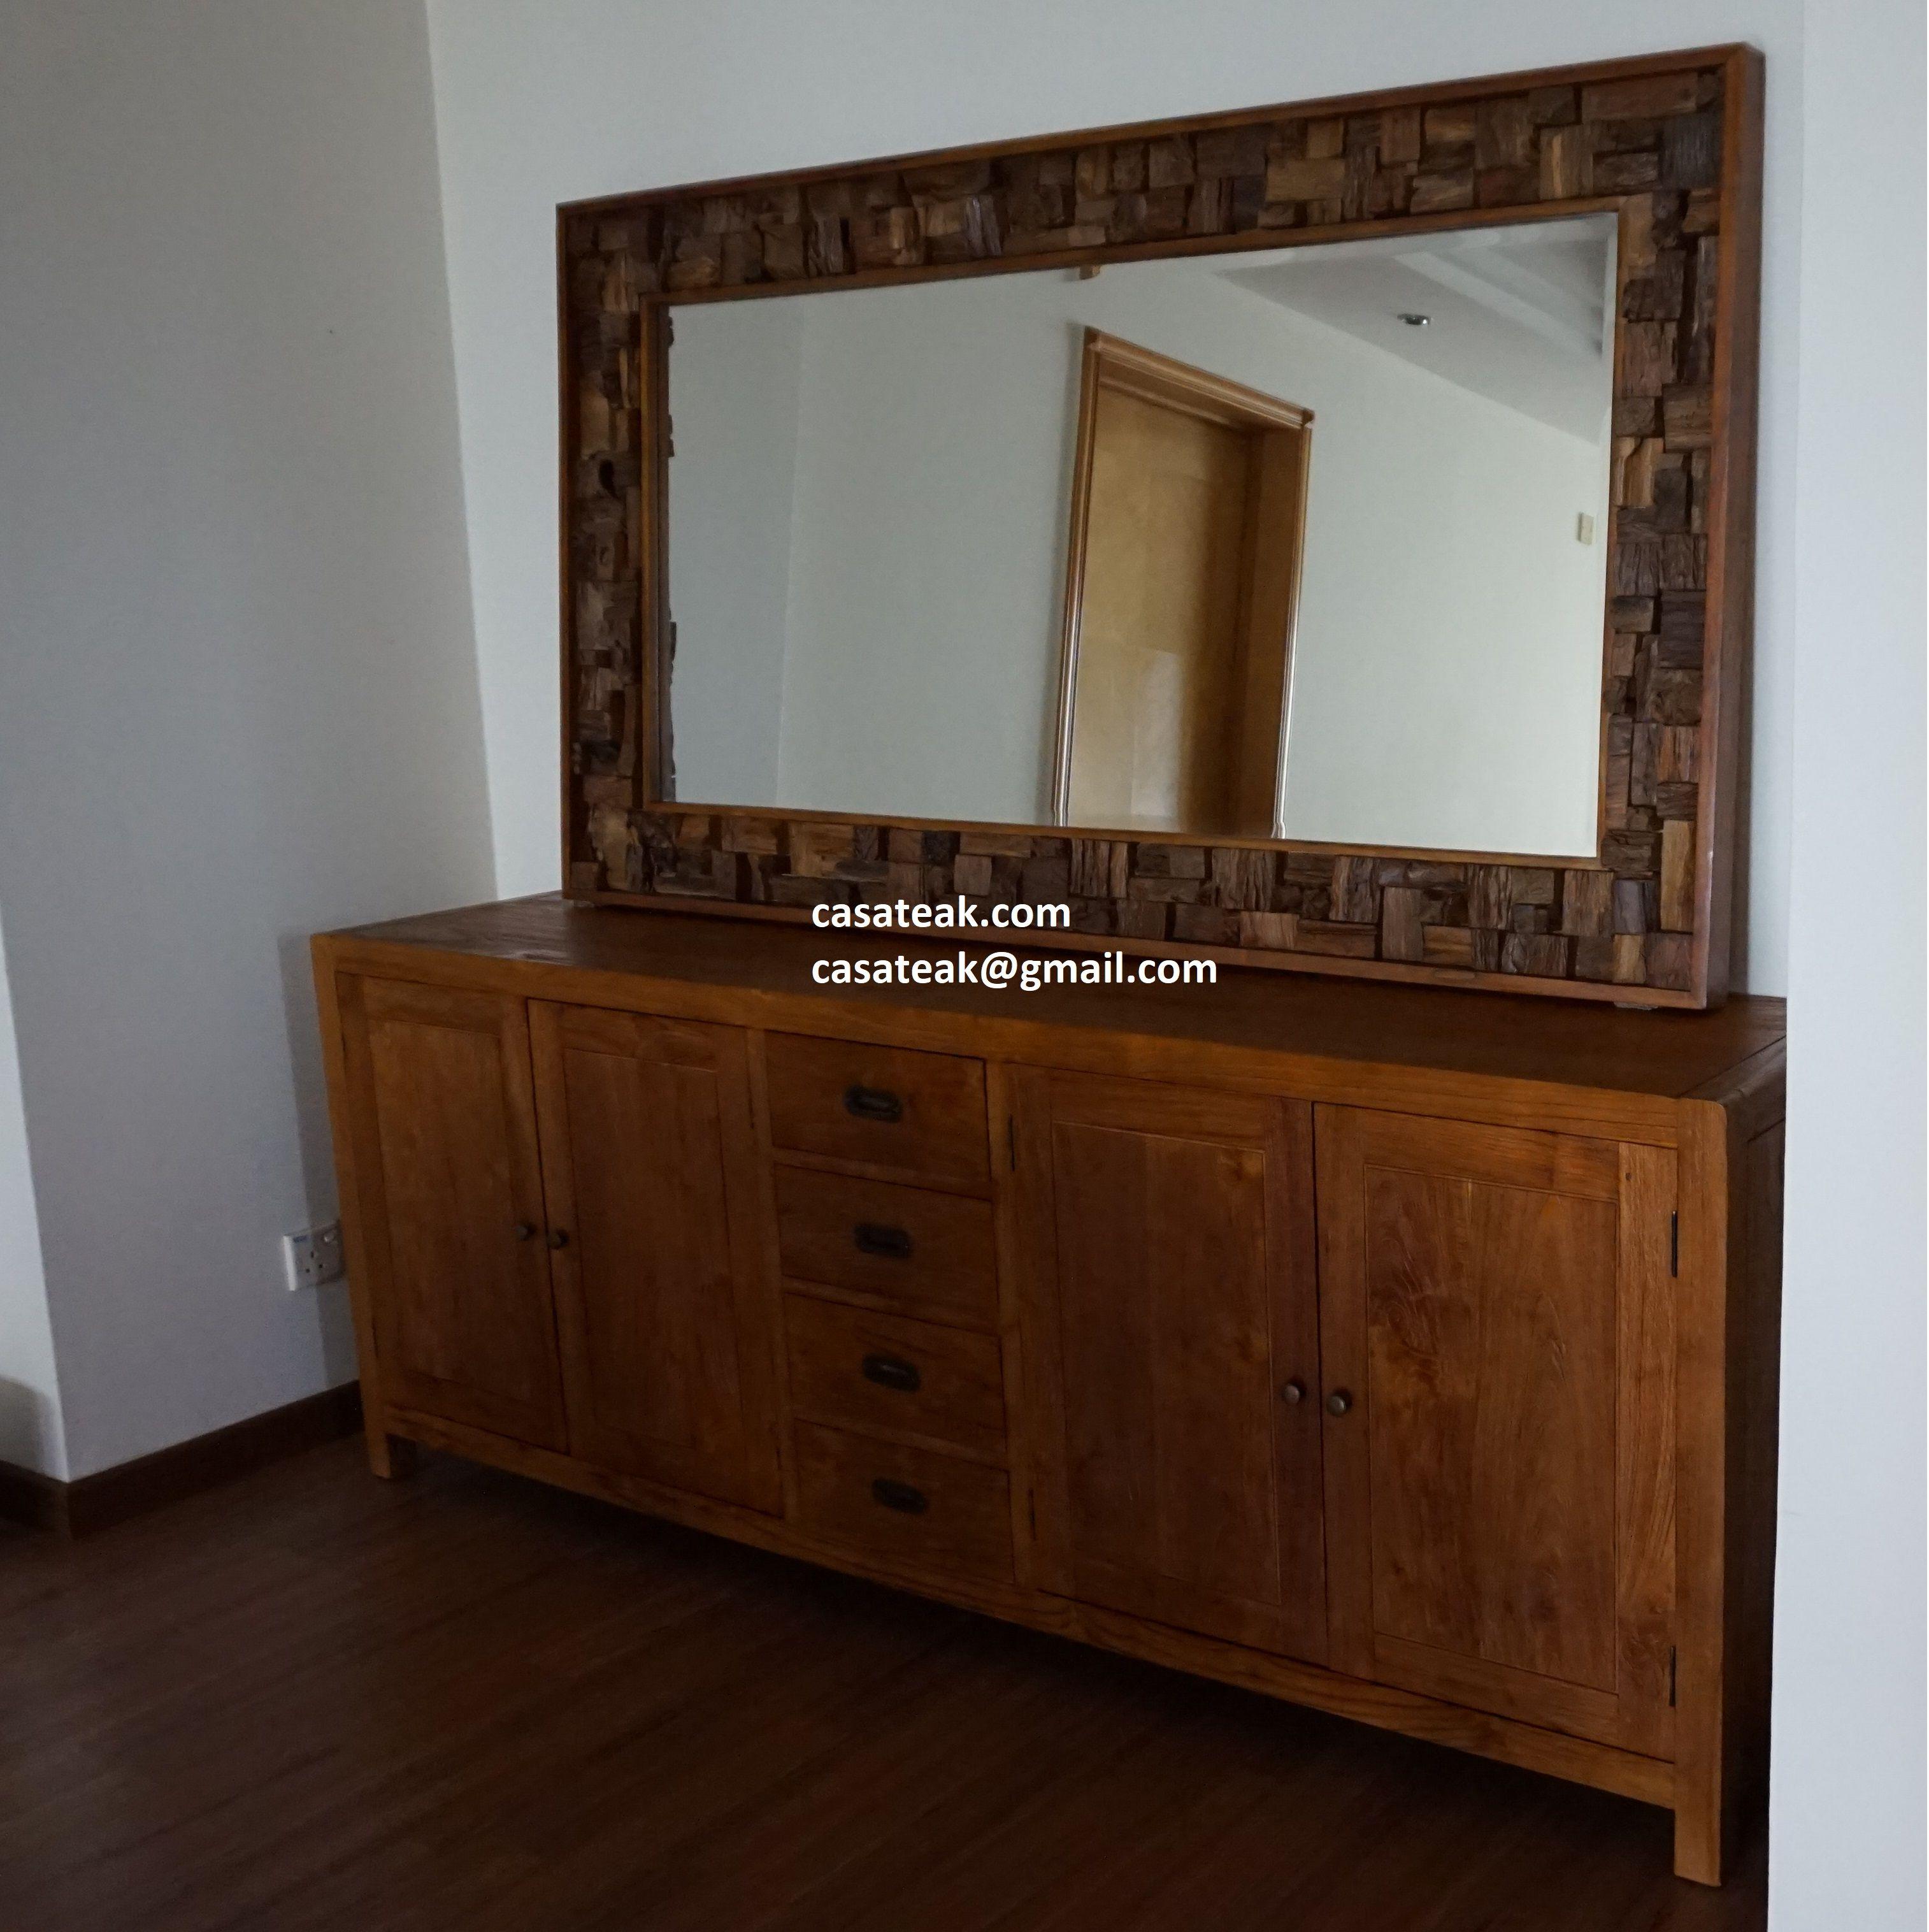 JB Sideboard SB 15-12 in 2019   Teak furniture, Teak wood ...